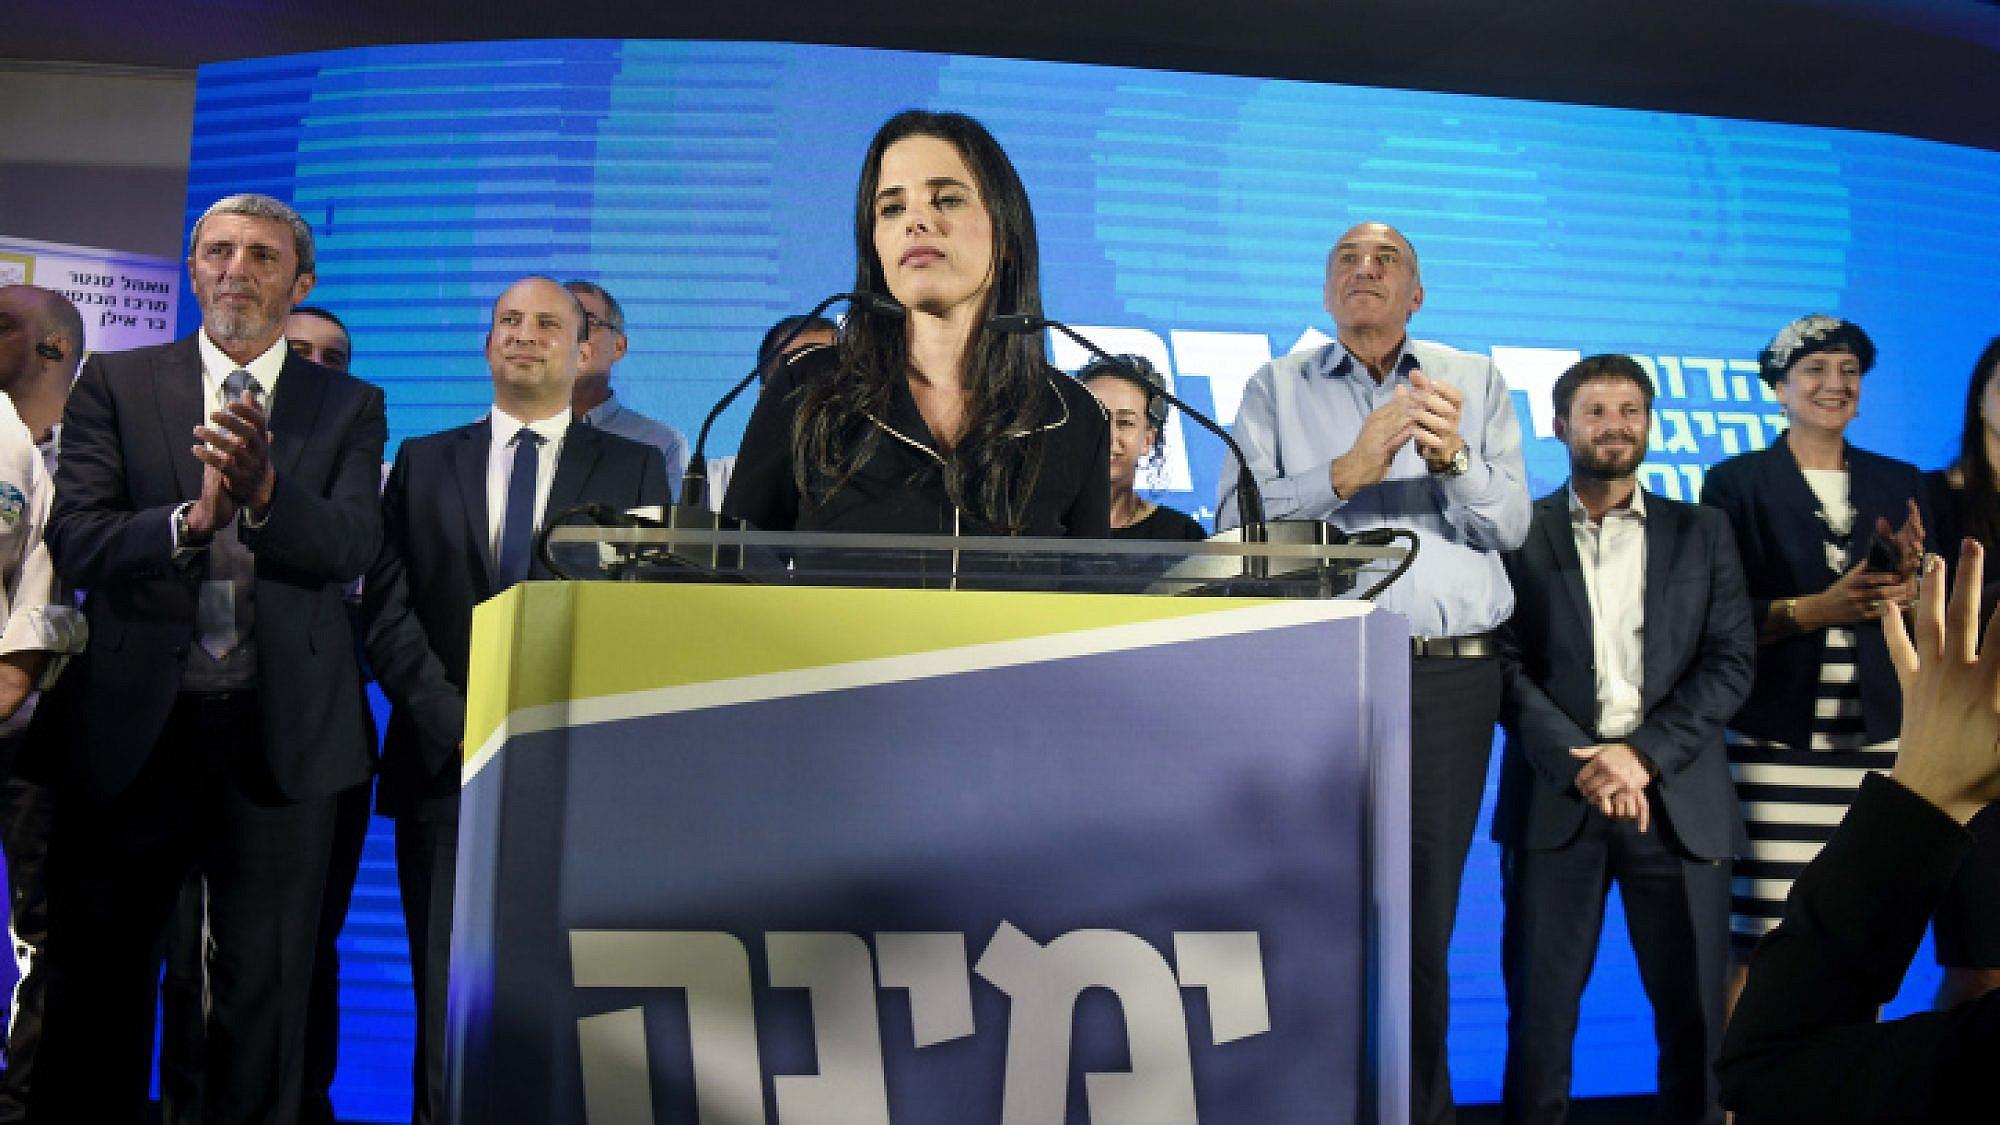 Yamina alliance dissolves hours after polls close - JNS.org